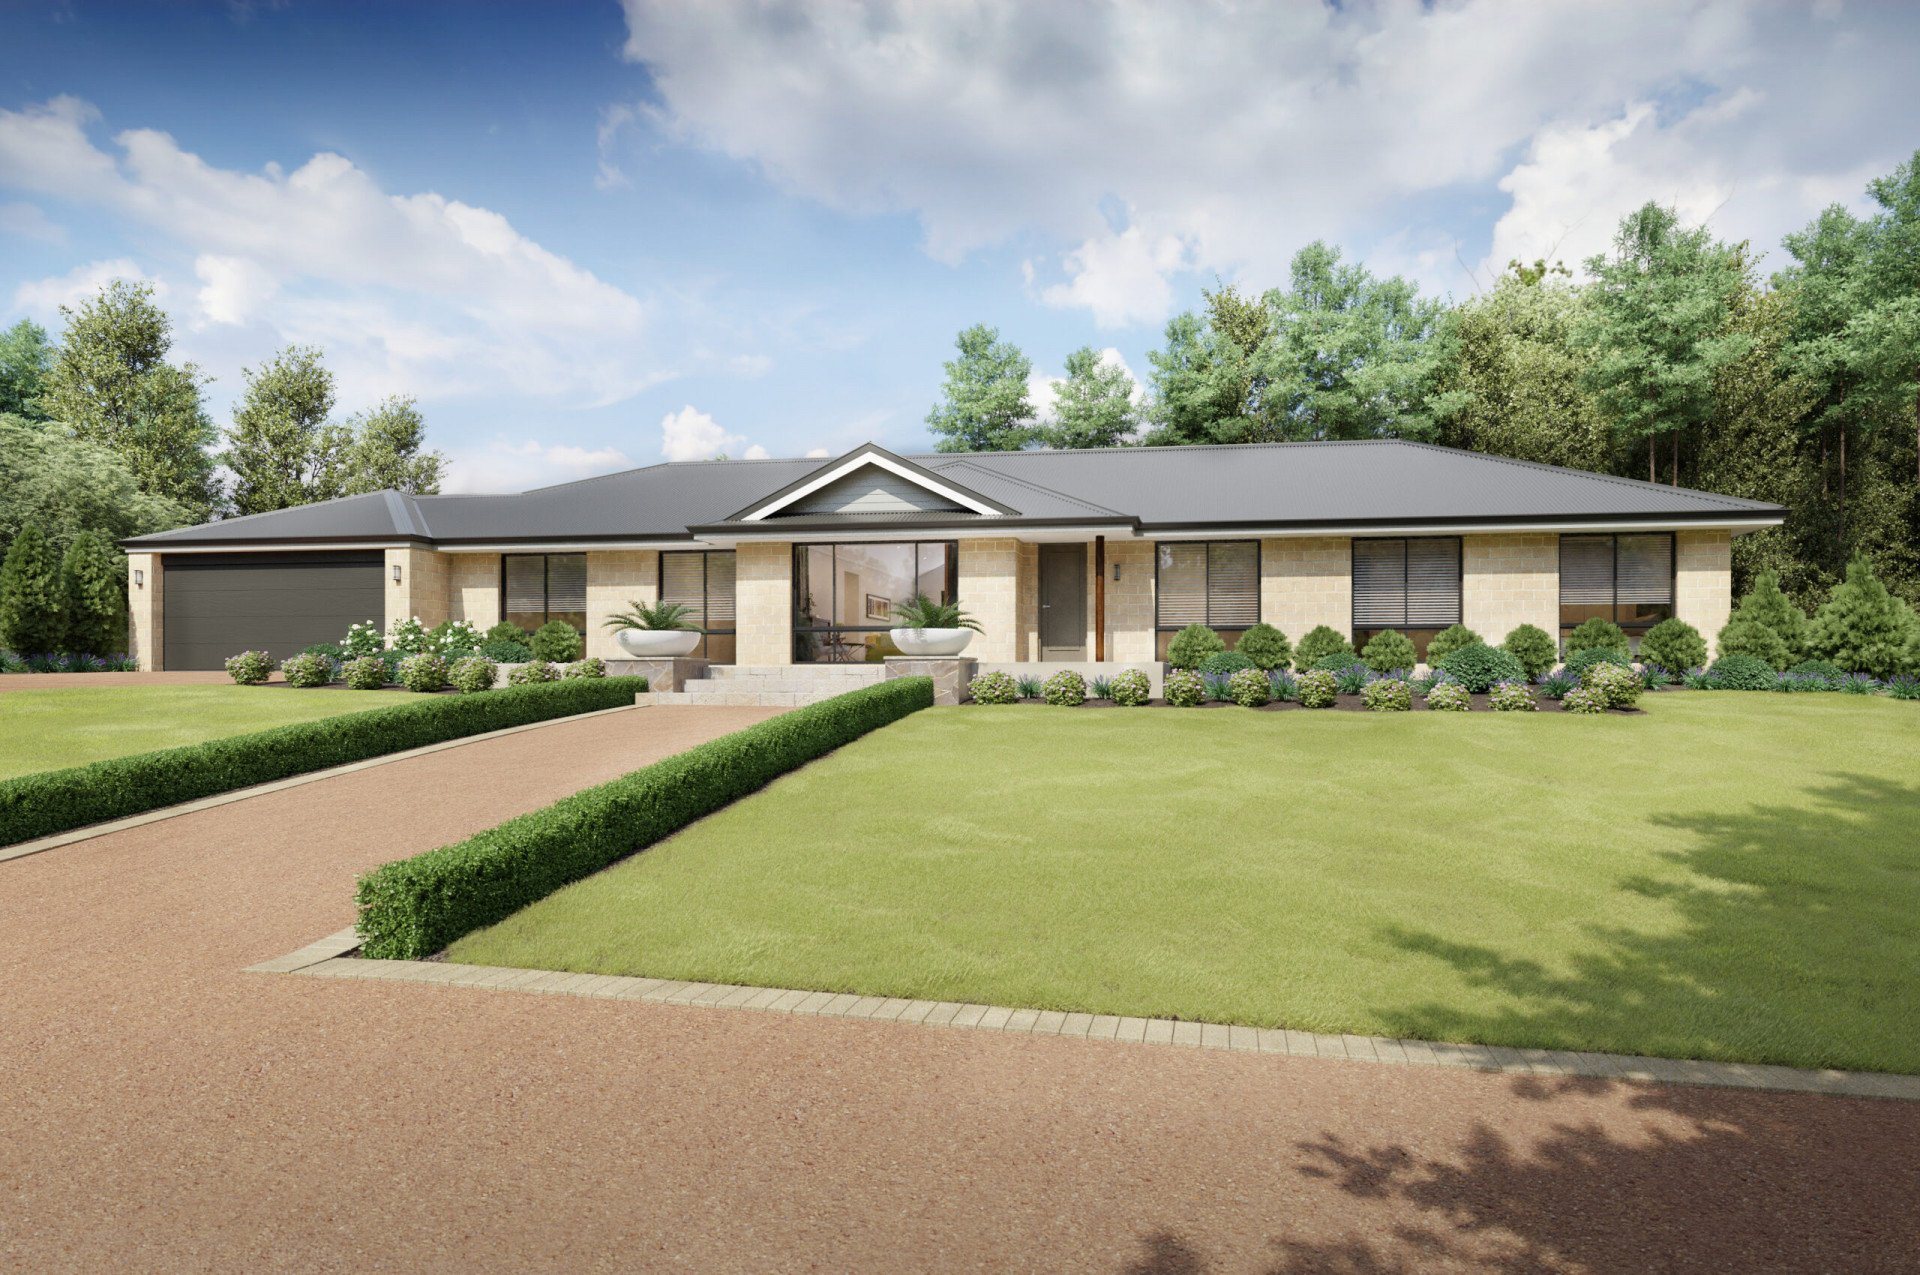 The-Dowley-Farmhouse-scaled